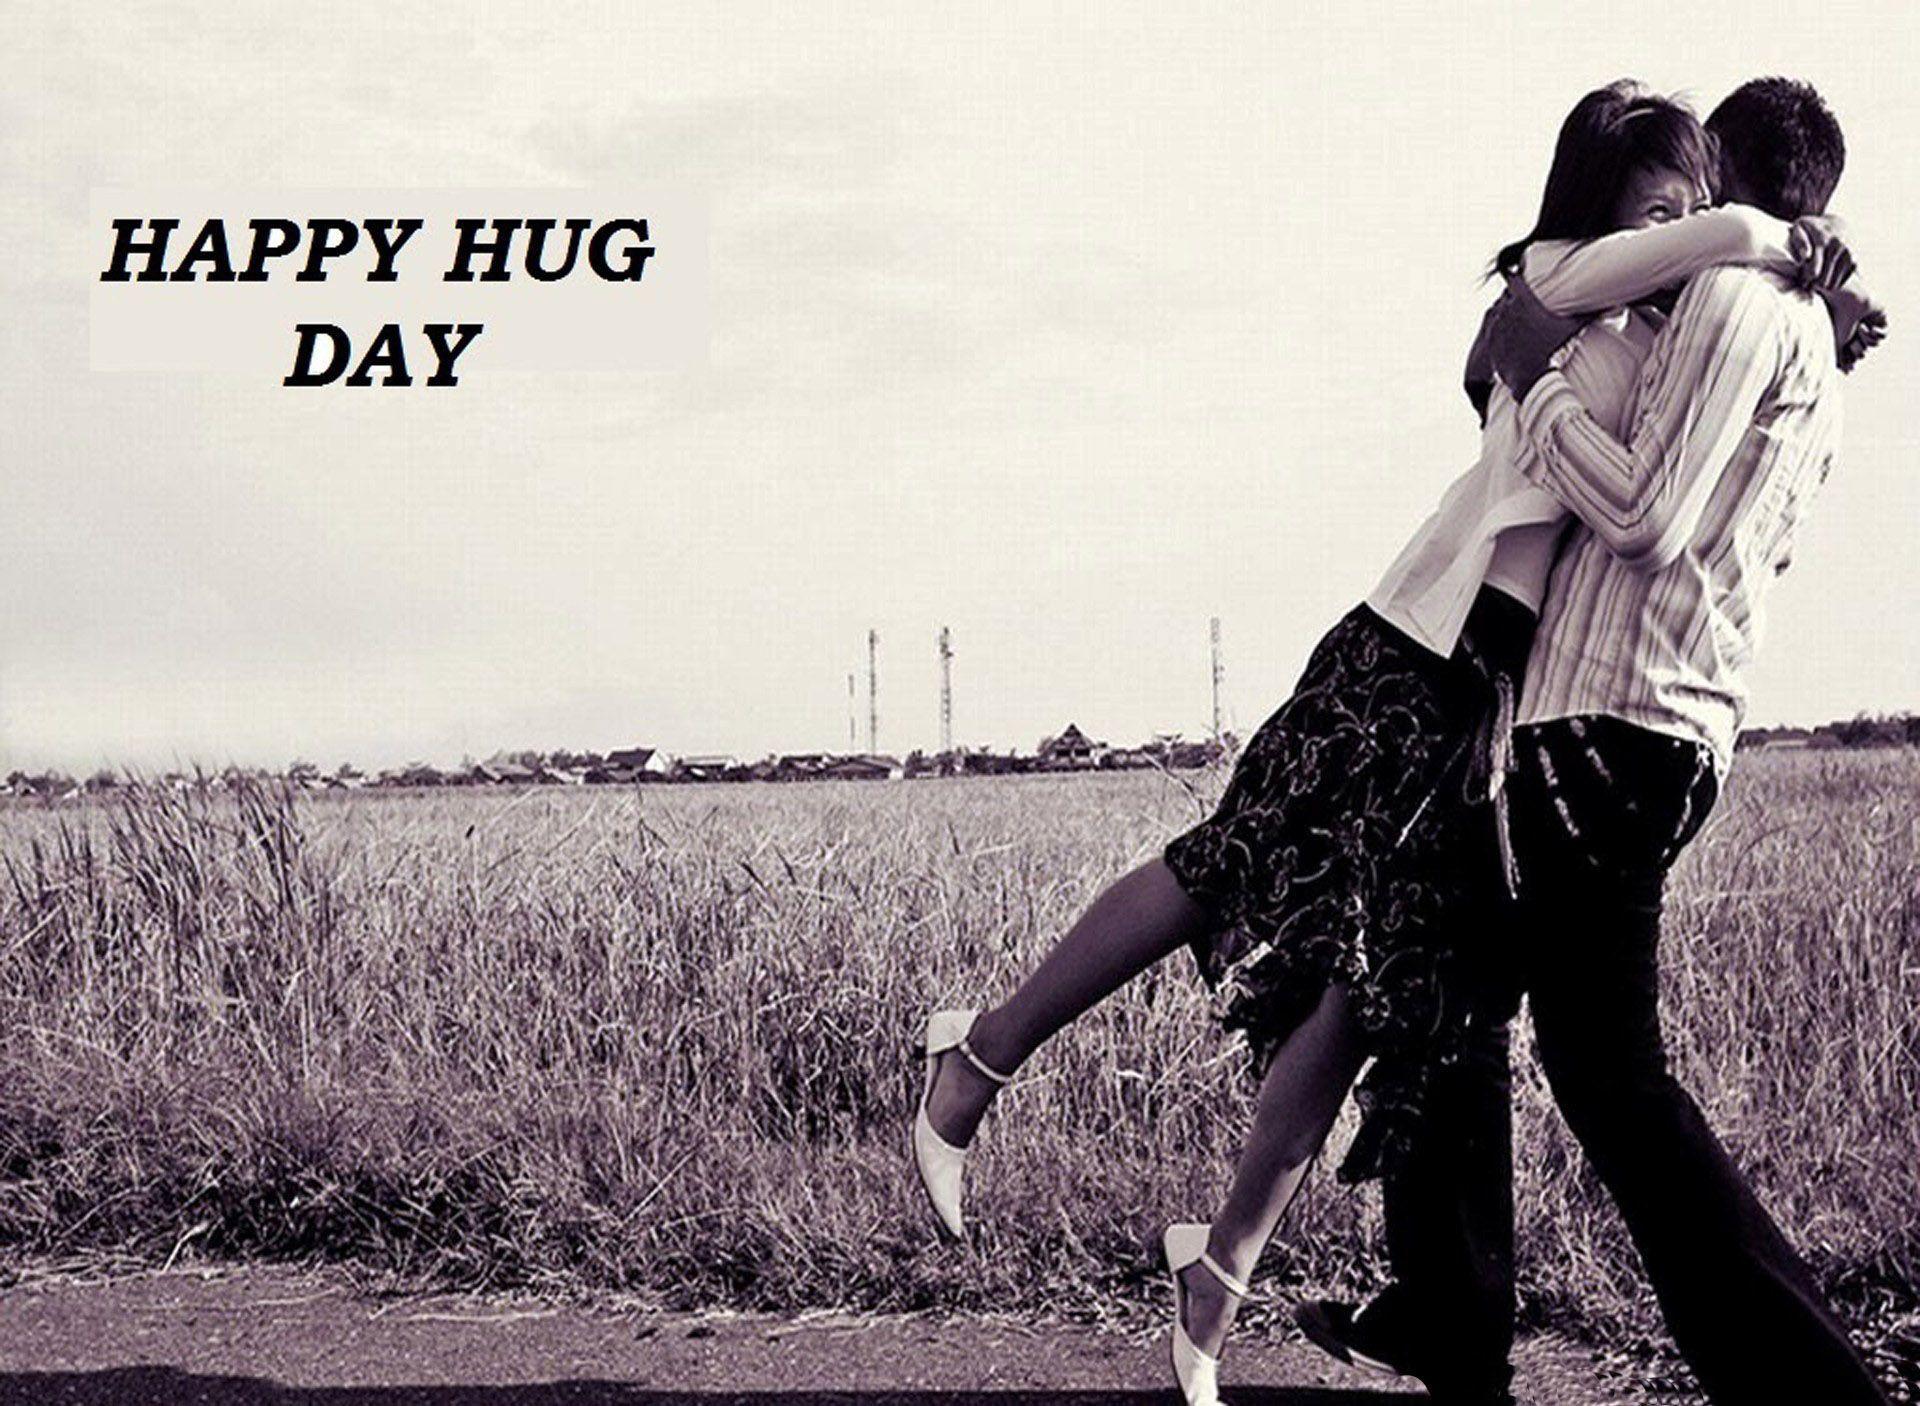 Romantic Hug Wallpapers HD - Wallpaper Cave